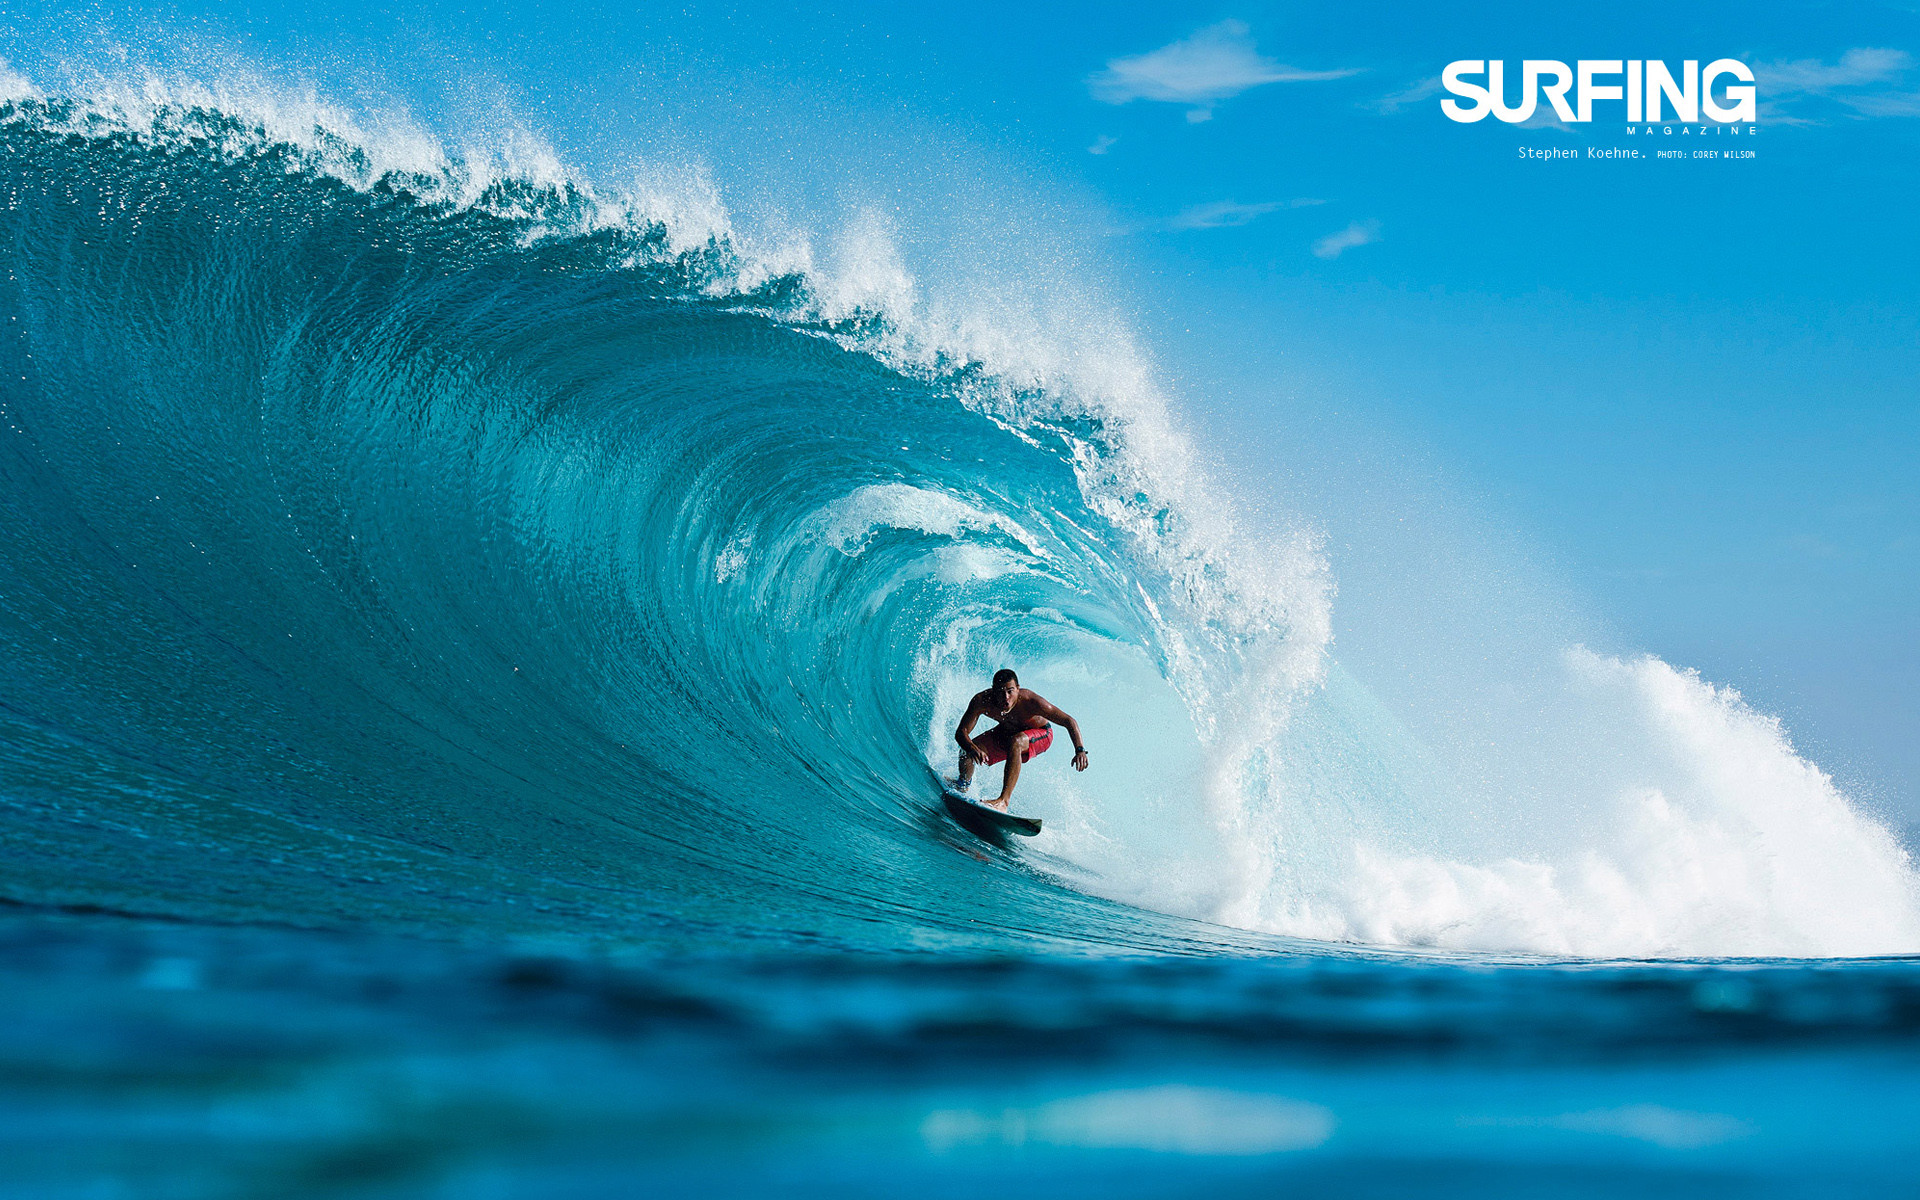 Surfing in Teahupoo Tahiti Wallpapers | HD Wallpapers